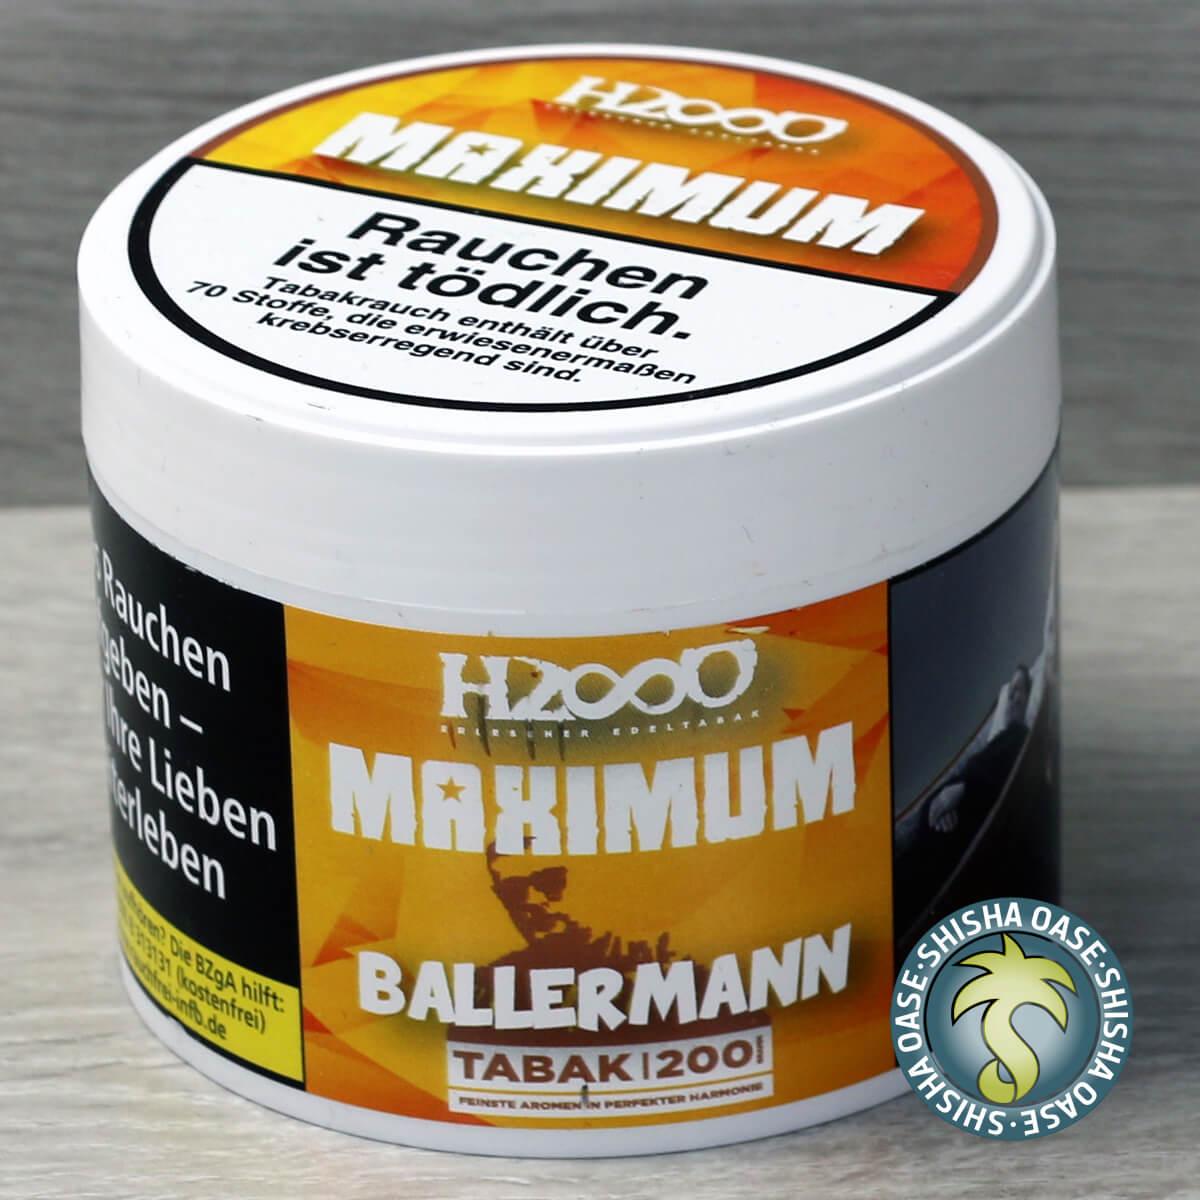 Hasso Tobacco Maximum Line 200g - Ballermann